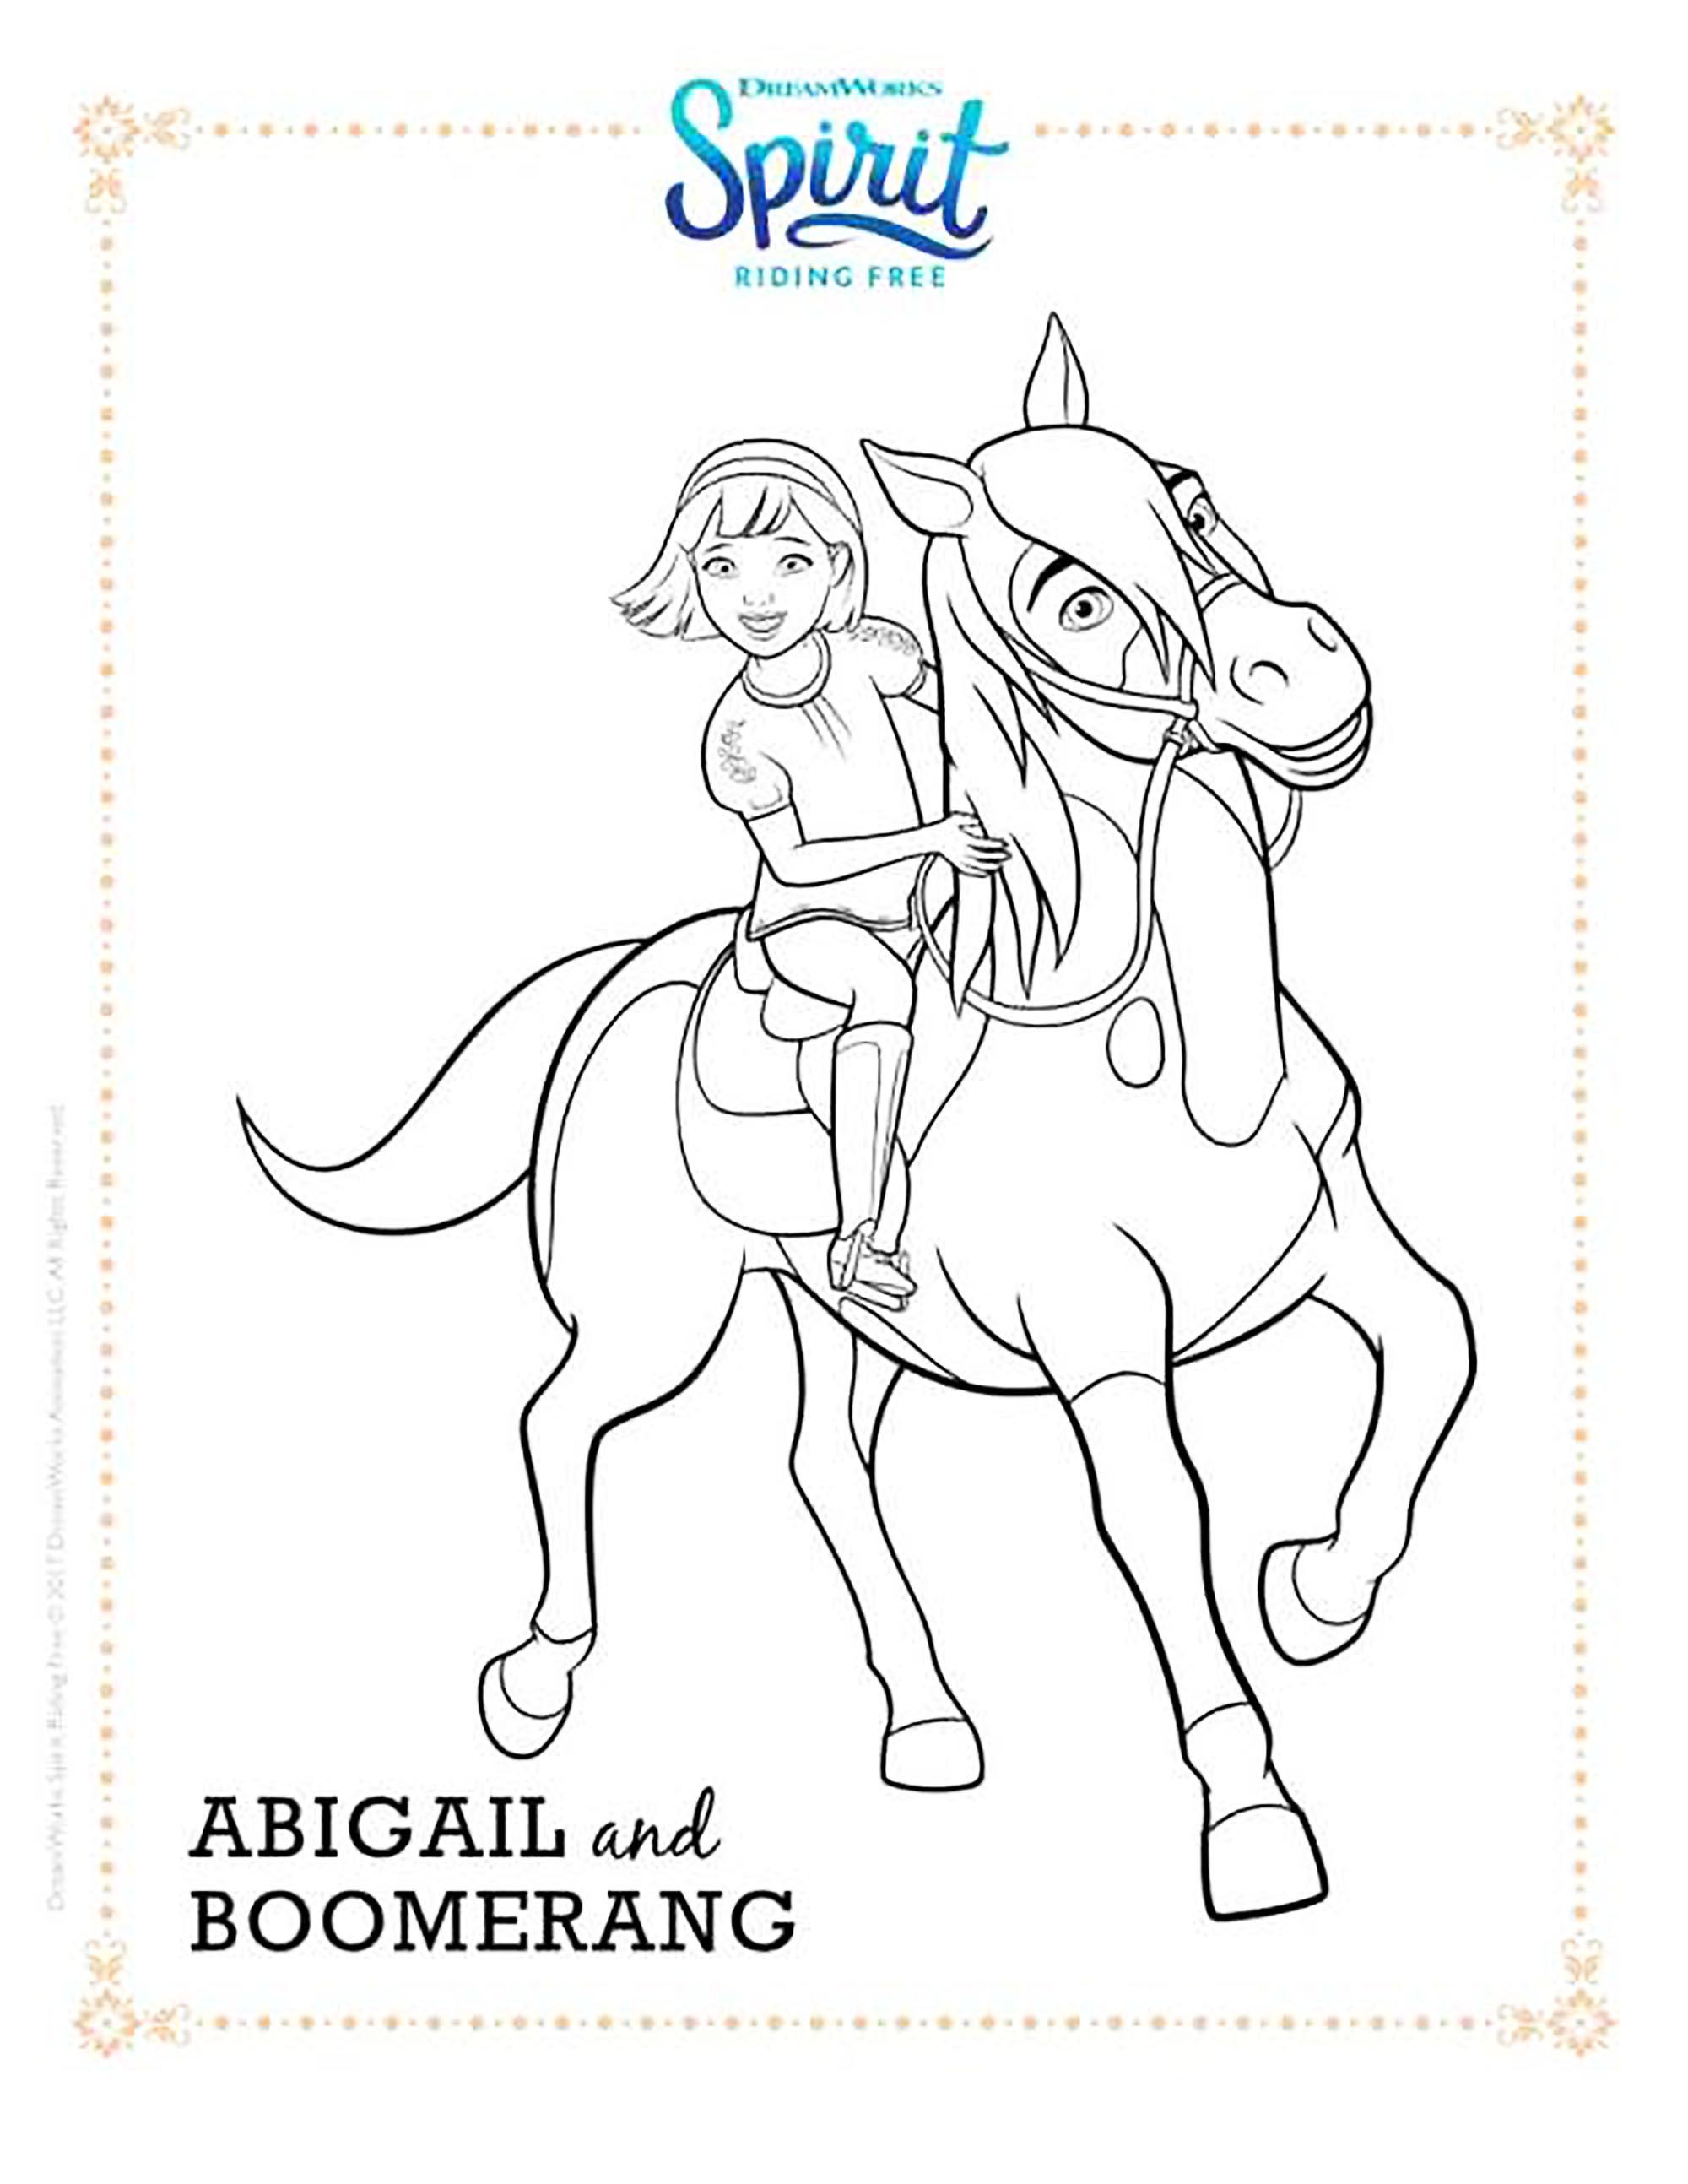 Beautiful Spirit coloring page